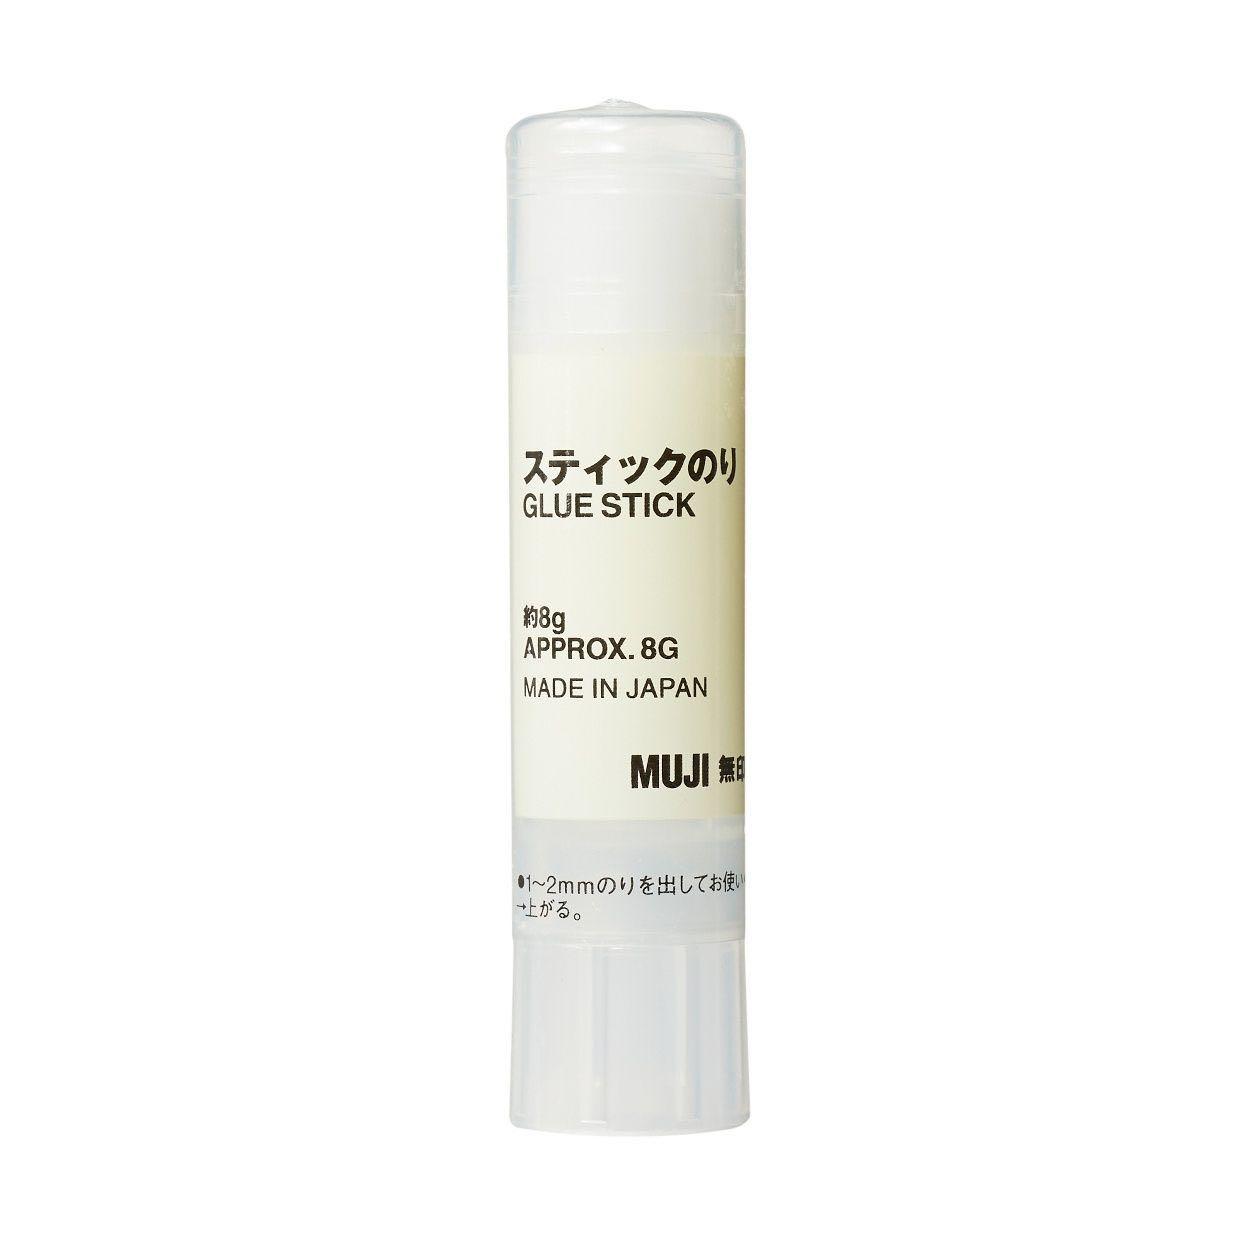 ‼️現貨‼️[代購]無印良品 MUJI 口紅膠 8g 日本製 glue stick